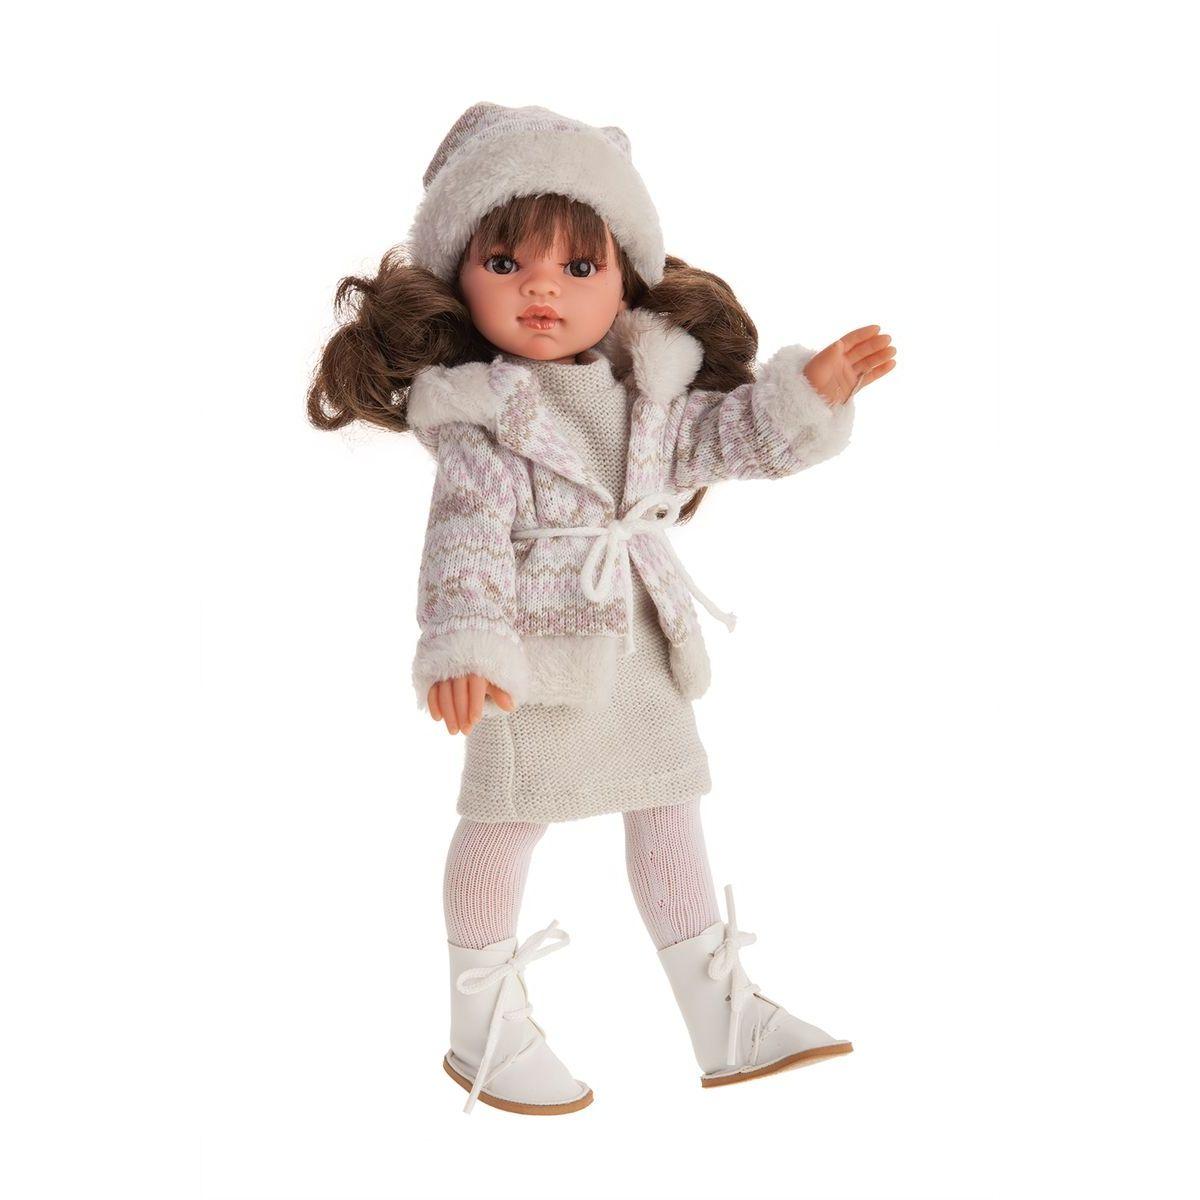 Antonio Juan 2592 Emily realistická panenka s celovinylovým tělem 33 cm